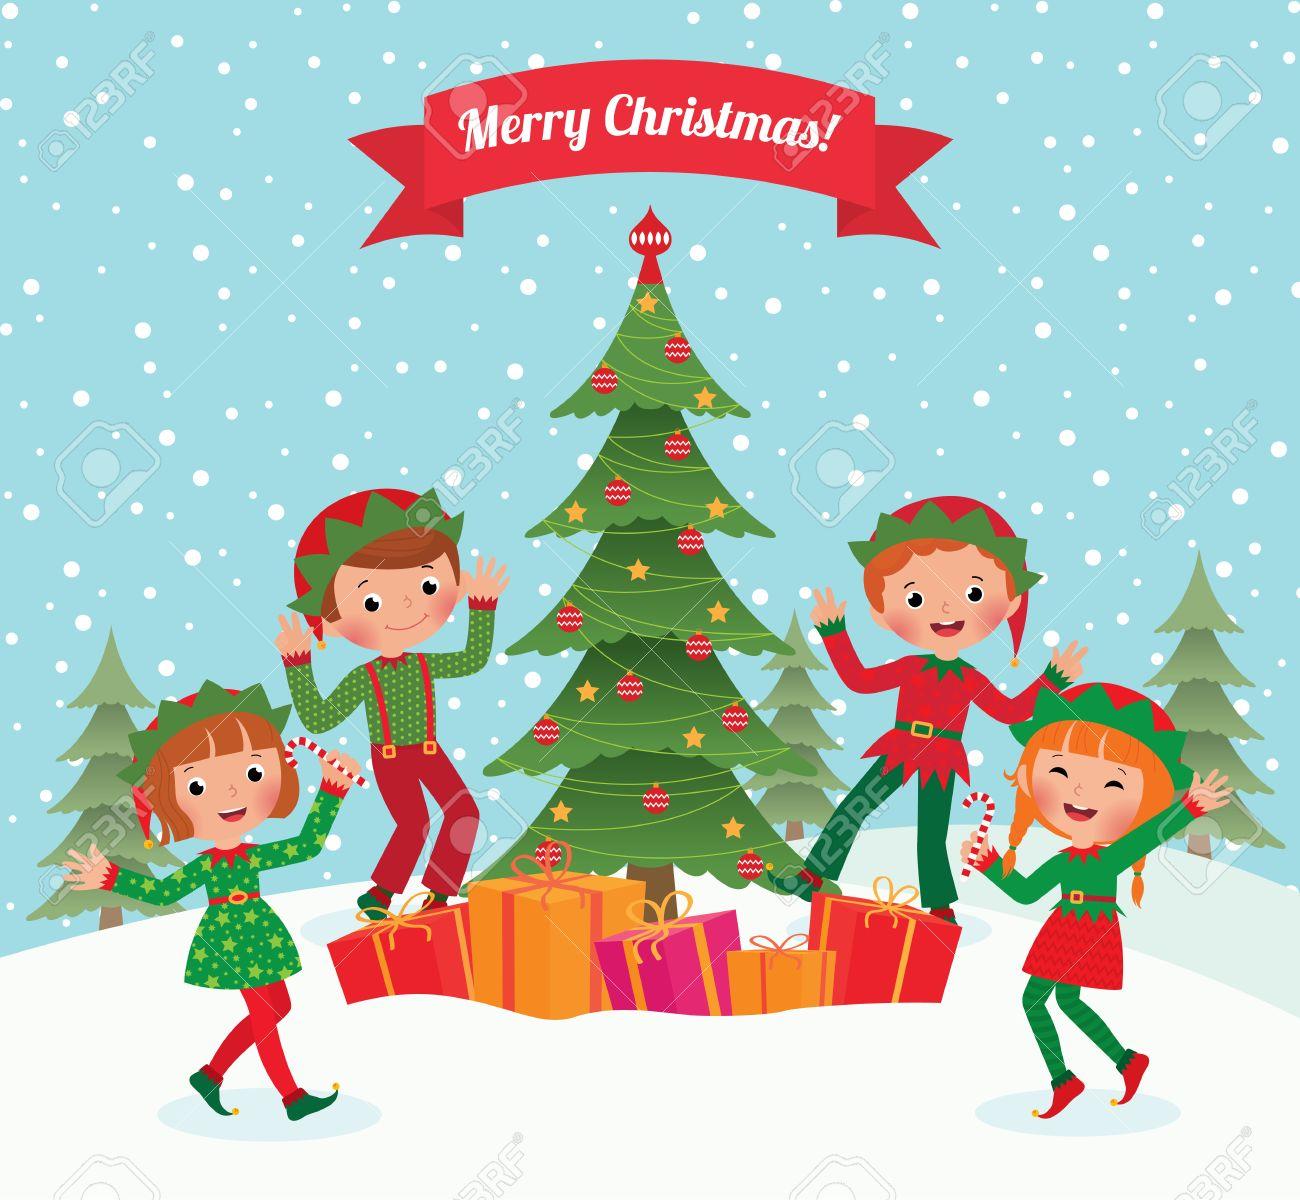 Christmas Party Images Cartoon.Cartoon Elves Having Fun At Christmas Party